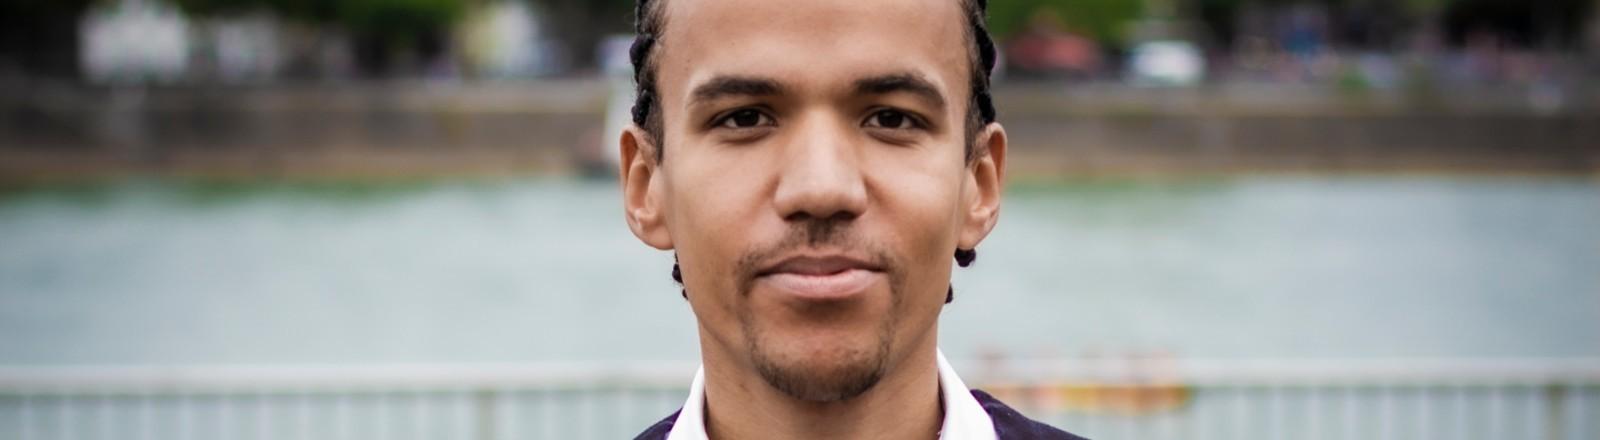 Anwalt Blaise Francis El Mourabit im Profil.